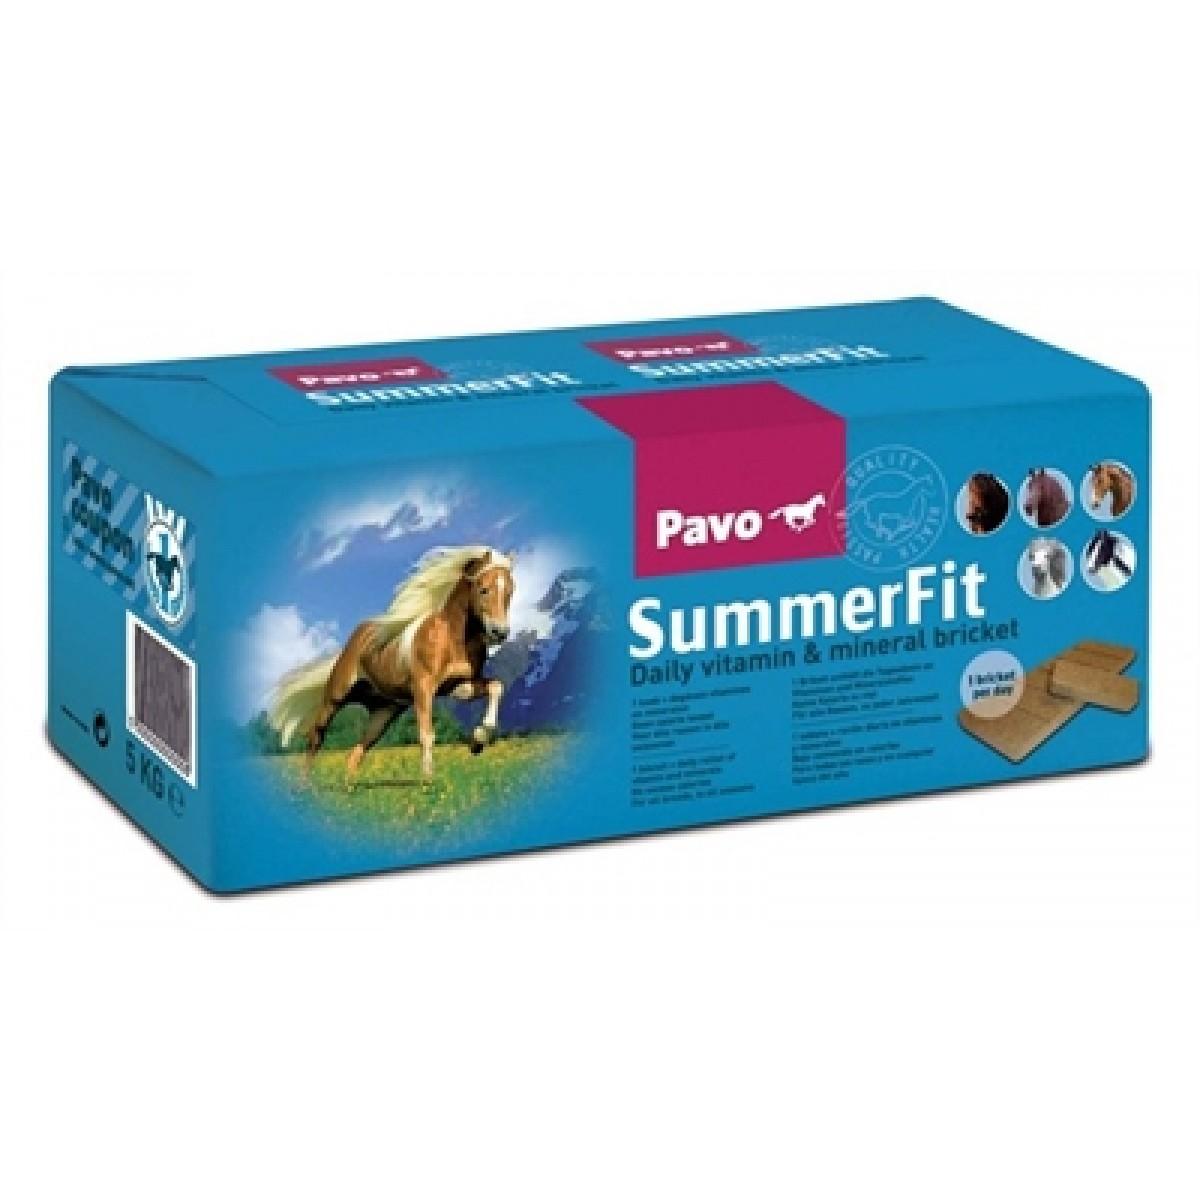 Pavo SummerFit 5 kg - 36 stk